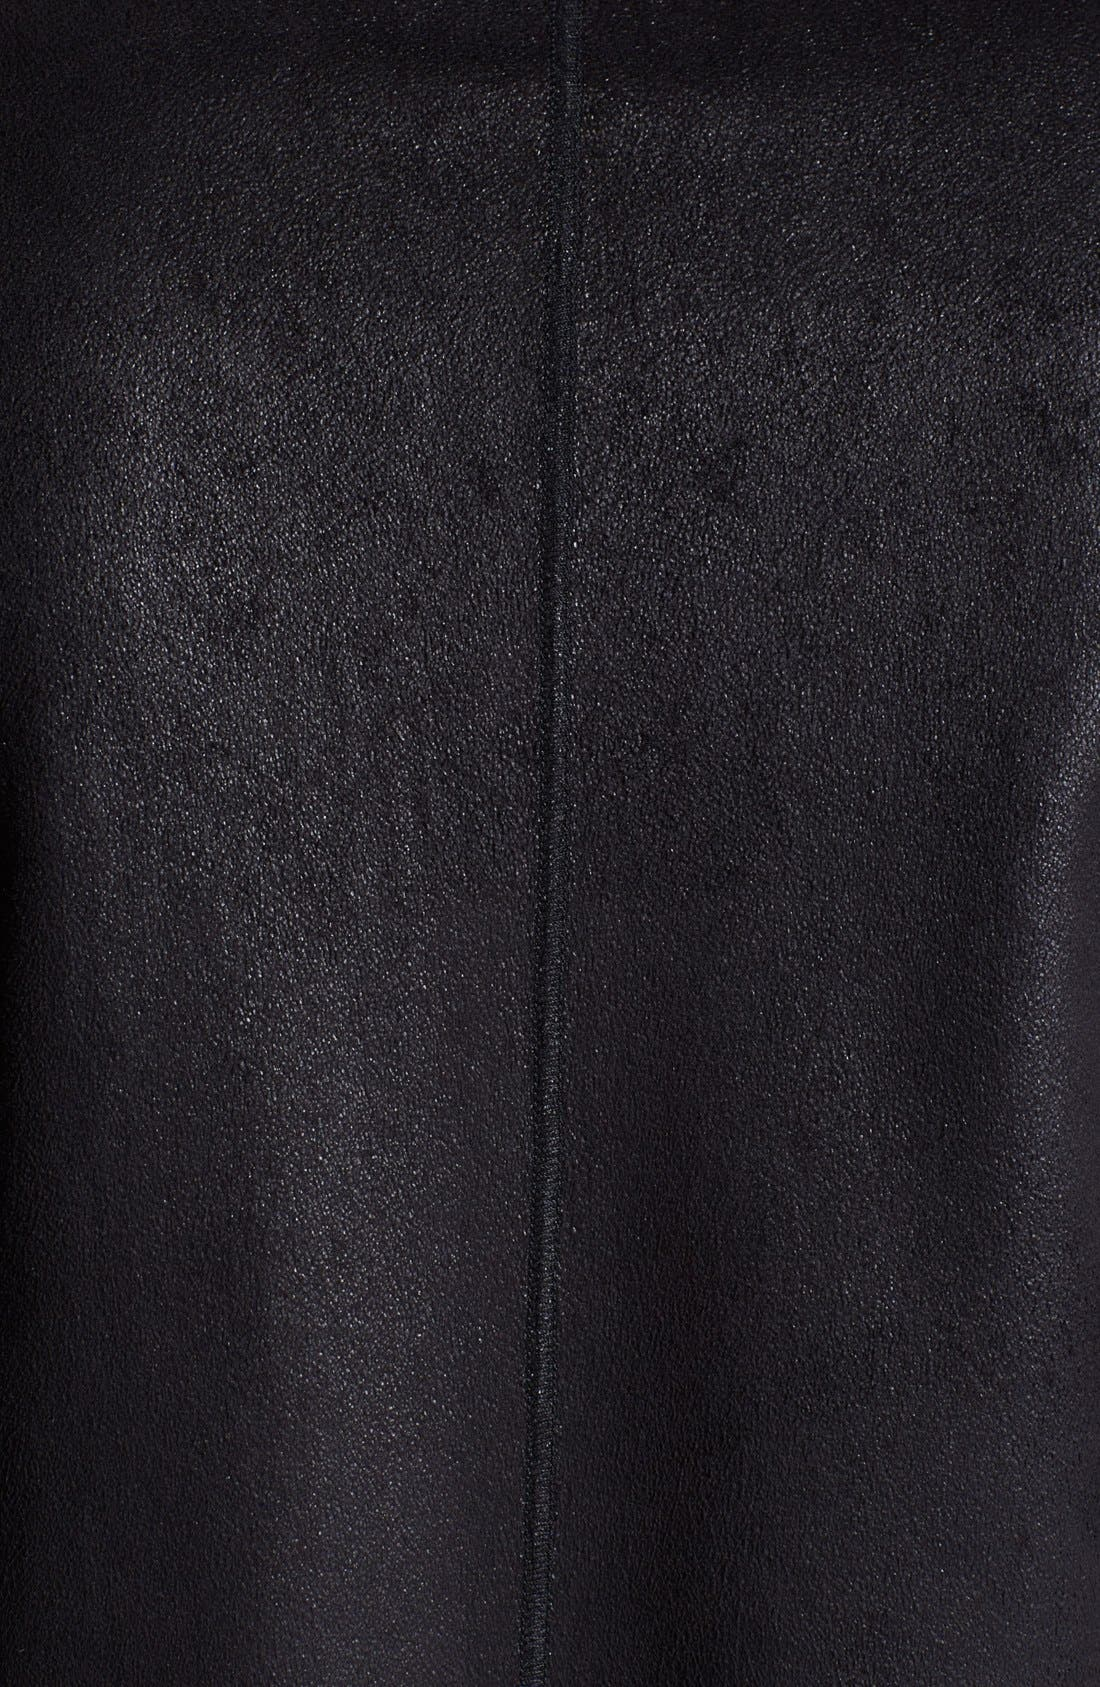 Armani Collezioni Faux Leather Duffle Coat,                             Alternate thumbnail 3, color,                             001